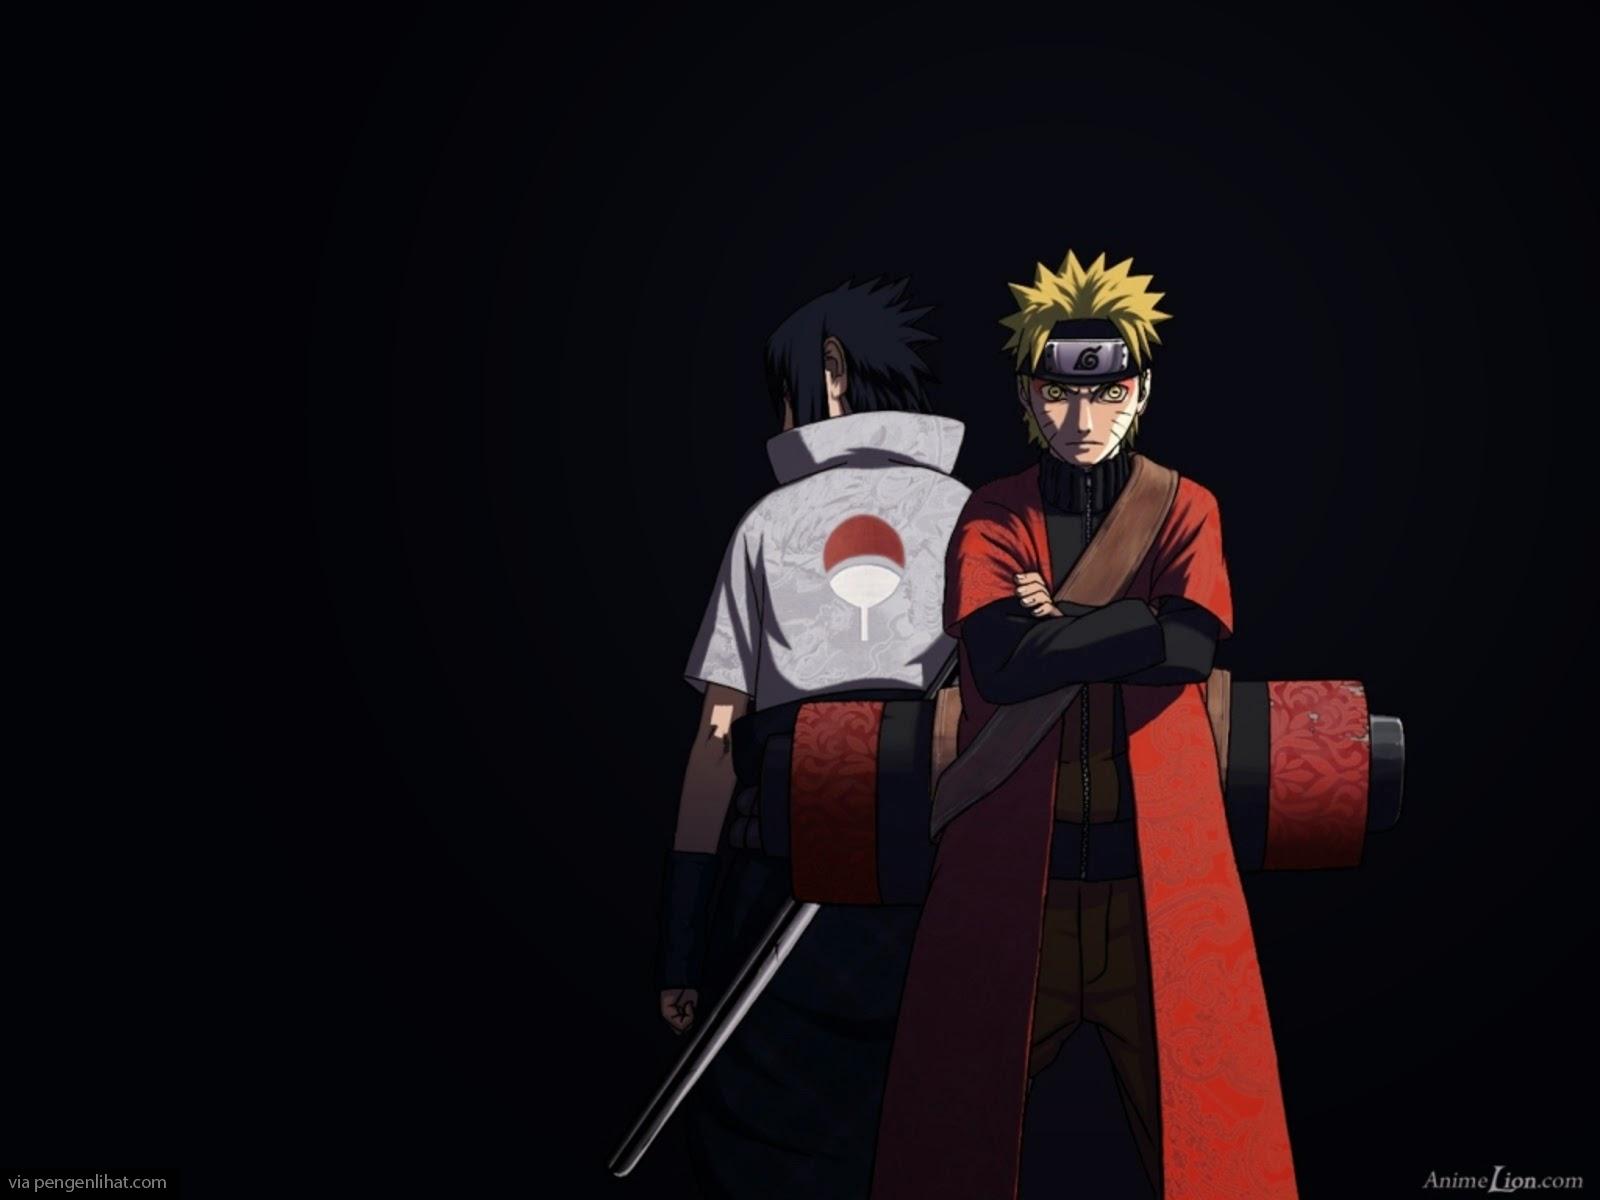 Wonderful Wallpaper Naruto Gambar - wallpaper-hd-naruto-shippuden--013  Gallery_873412.jpg